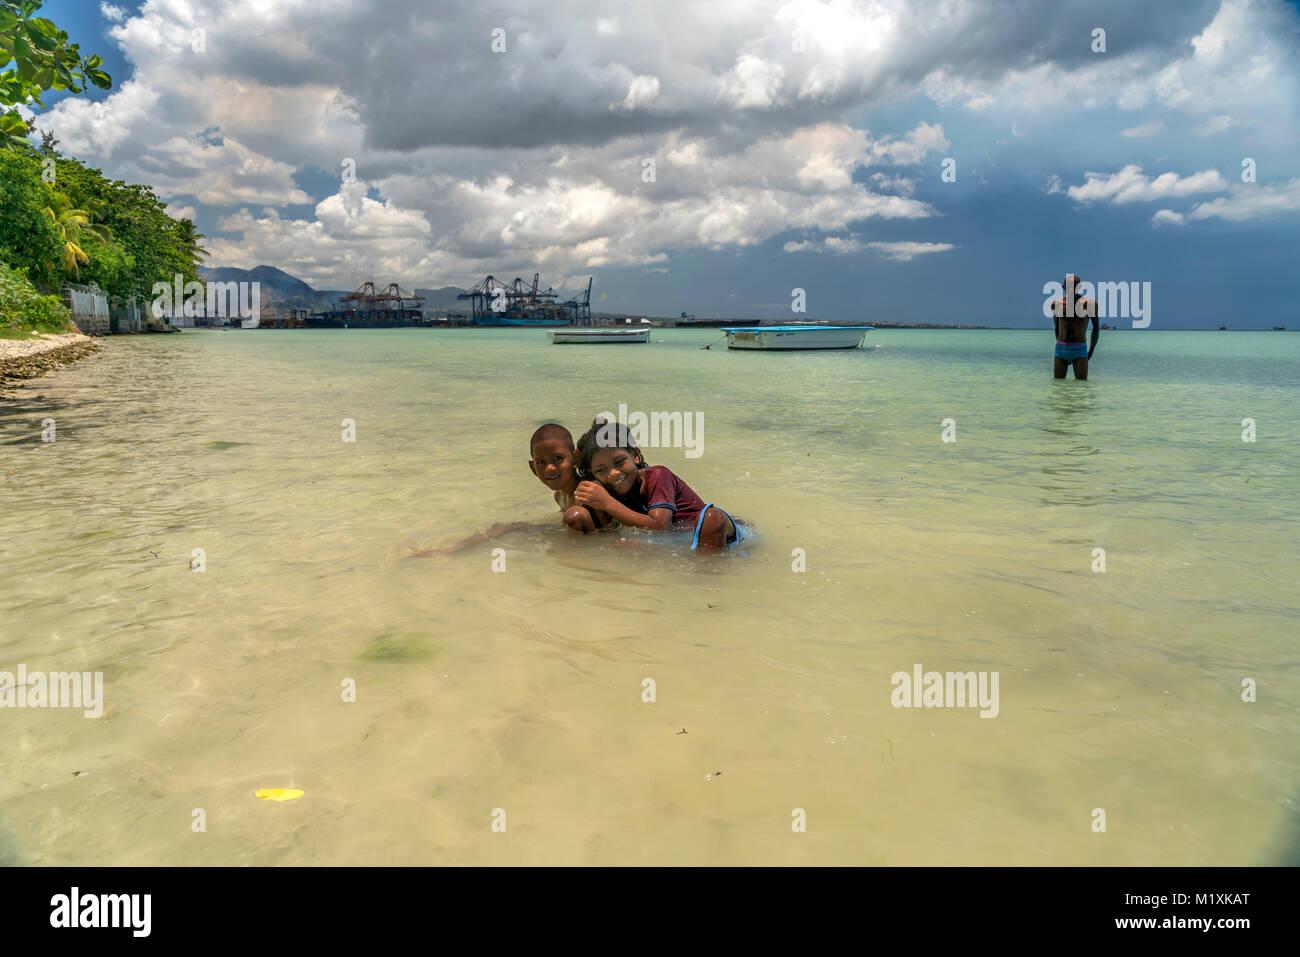 Kinder baden in der Bucht Baie du Tombeau, Tombeau Bay , Mauritius, Afrika,     local children bathing at Baie du - Stock Image